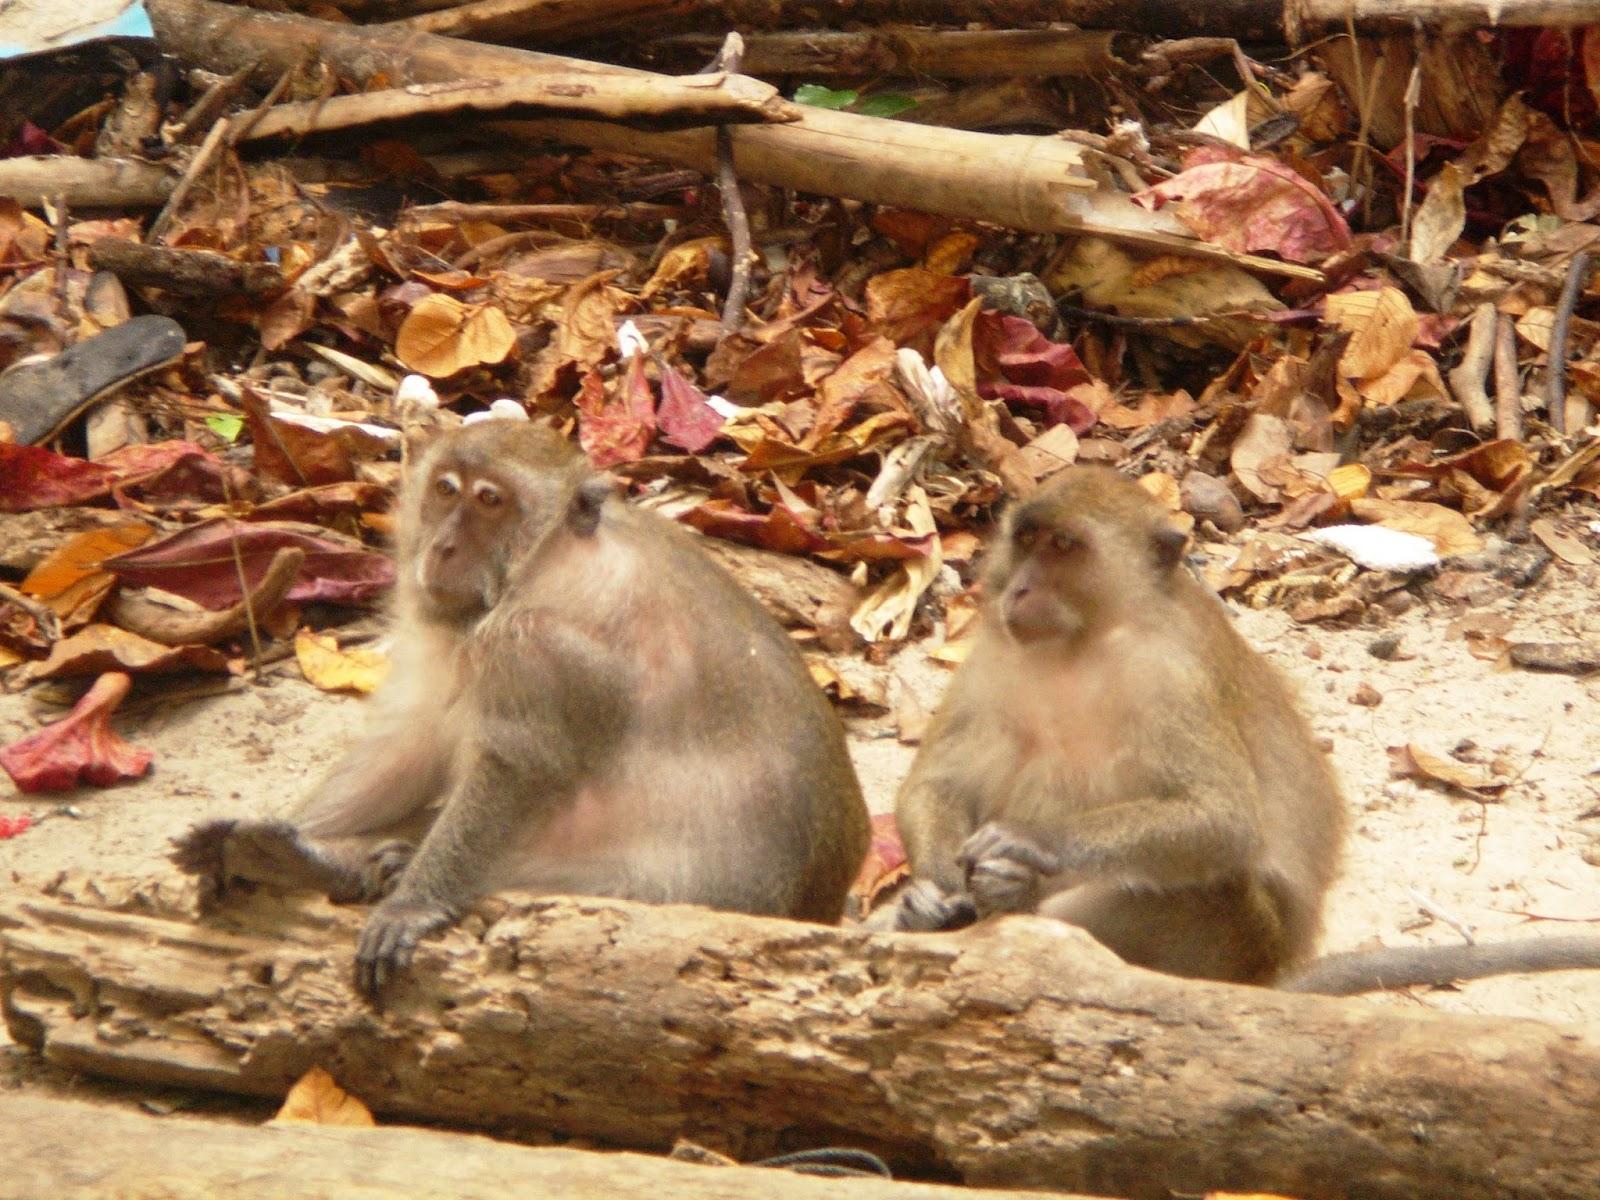 phi-phi-island-thailand-beach-asia-monkeys